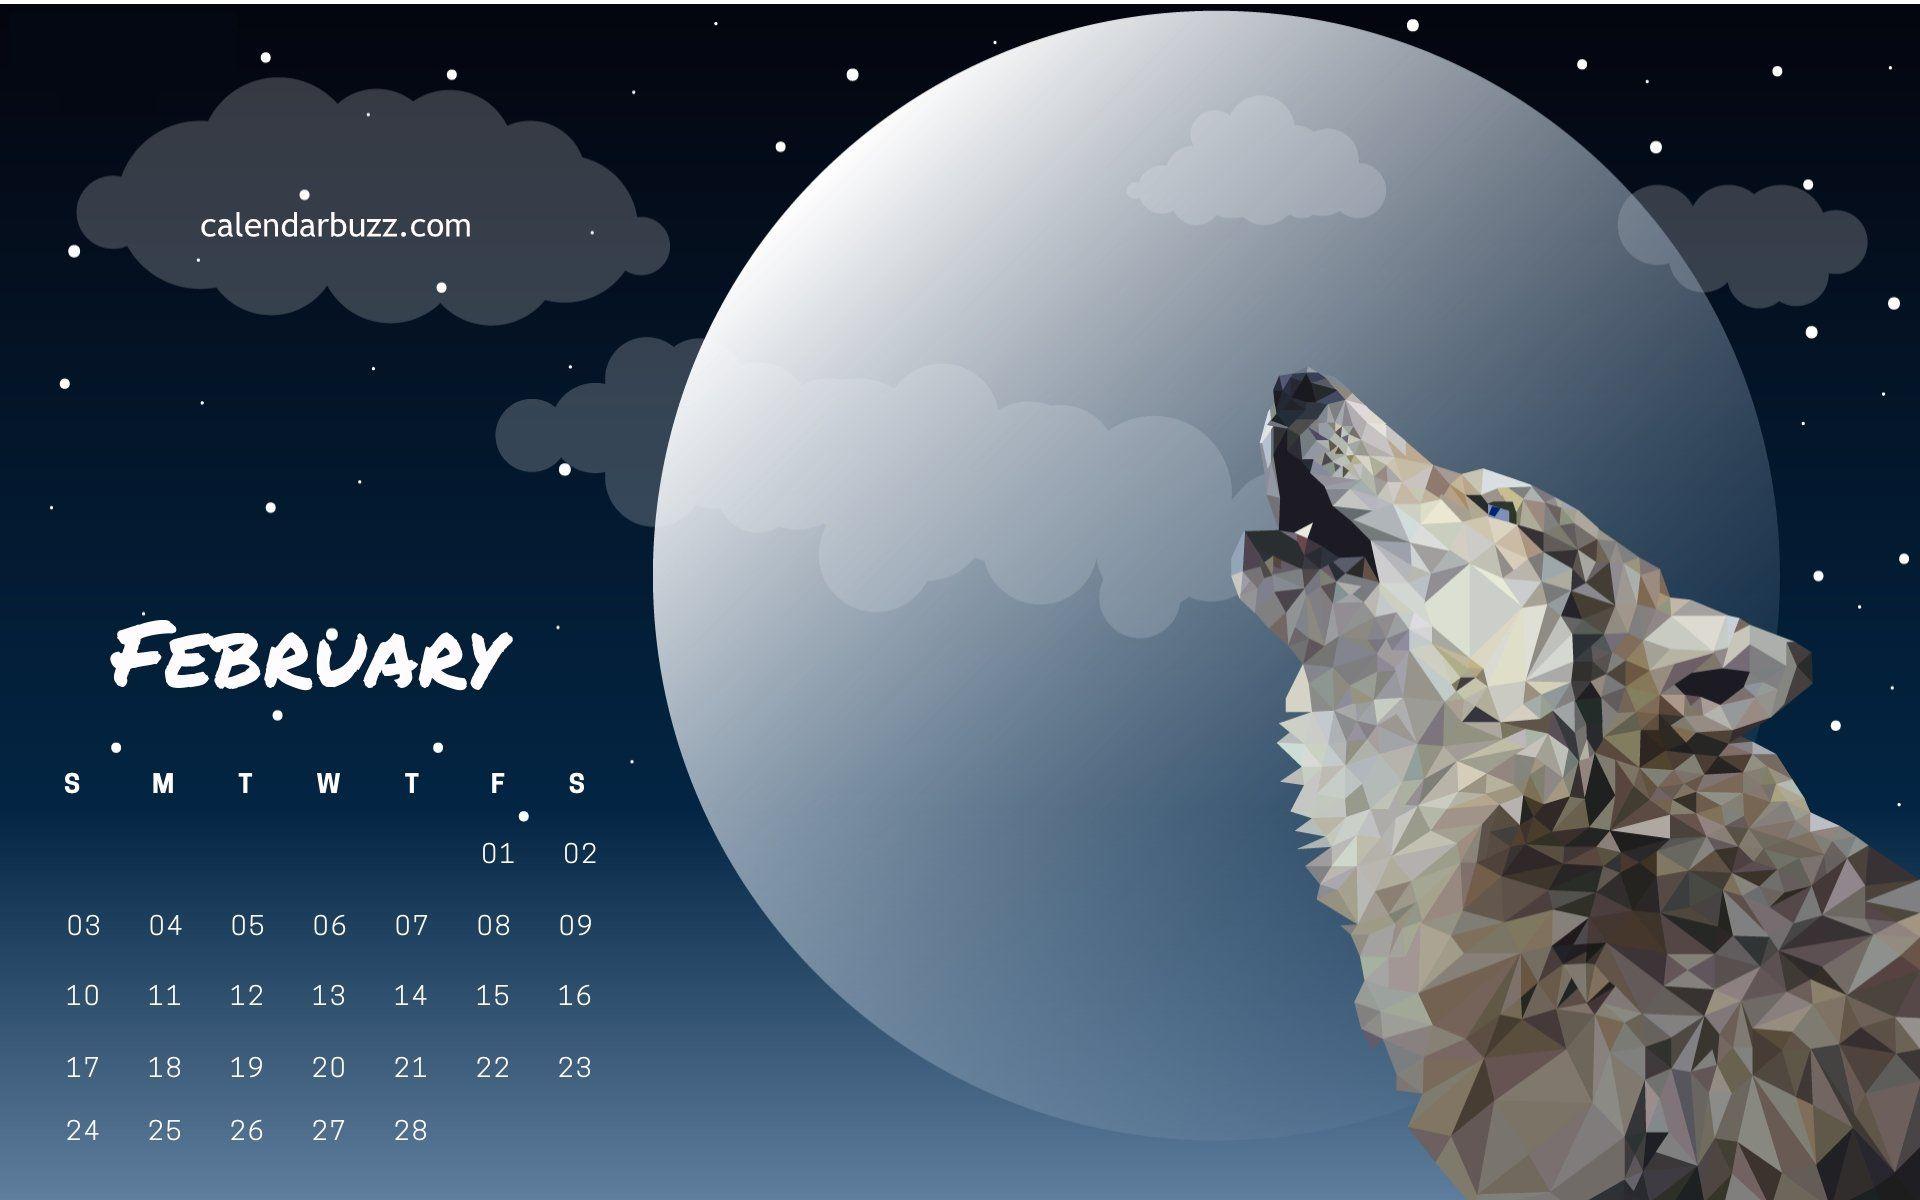 February 2019 Wolf Calendar february 2019 wolf calendar wallpaper | 2019 Calendars | Calendar